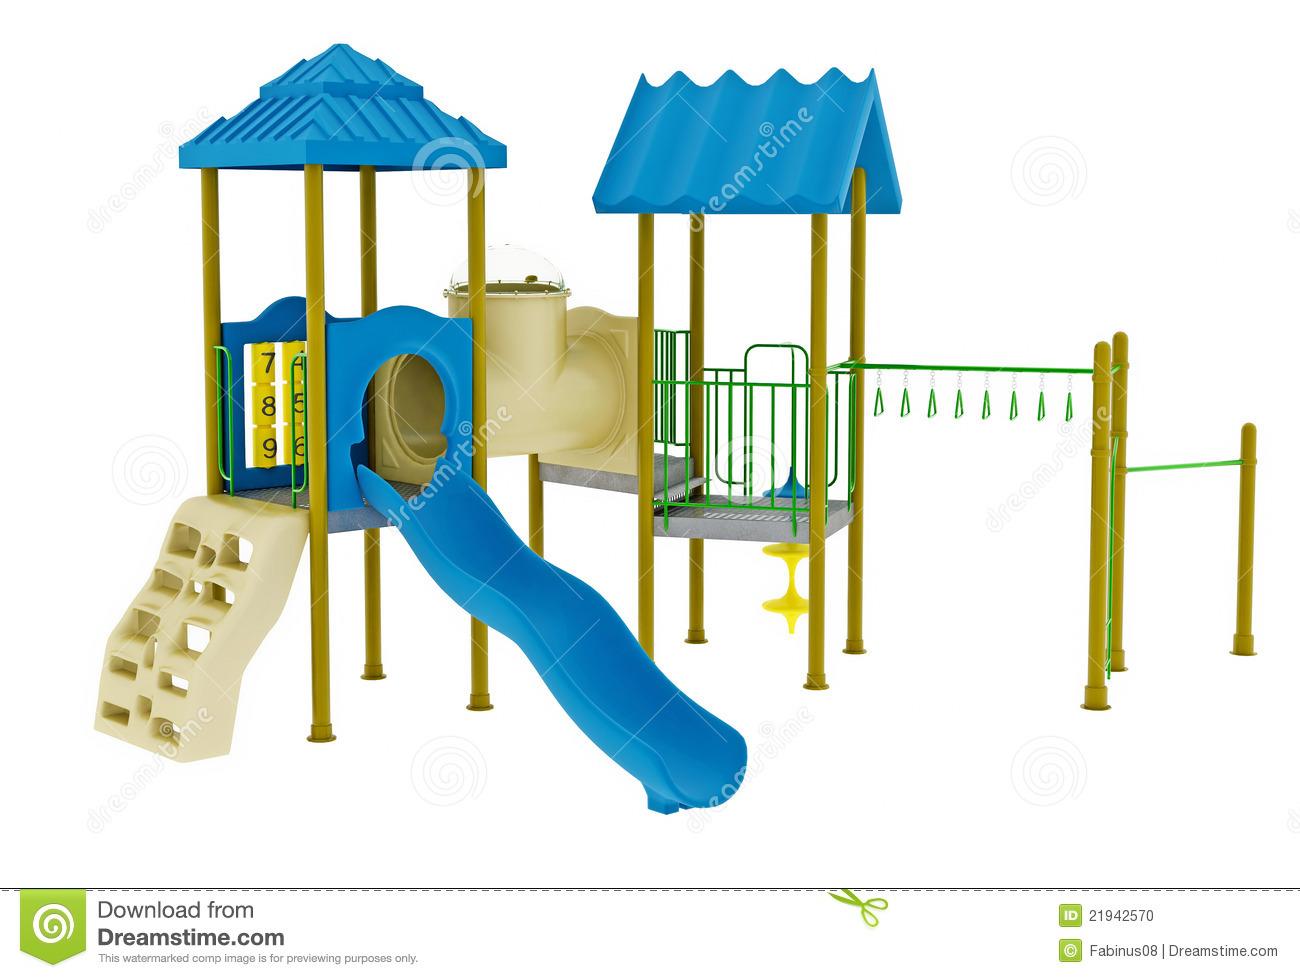 Clip Art Playground Clip Art be safe on playground clipart kid equipment clip art adventure play art